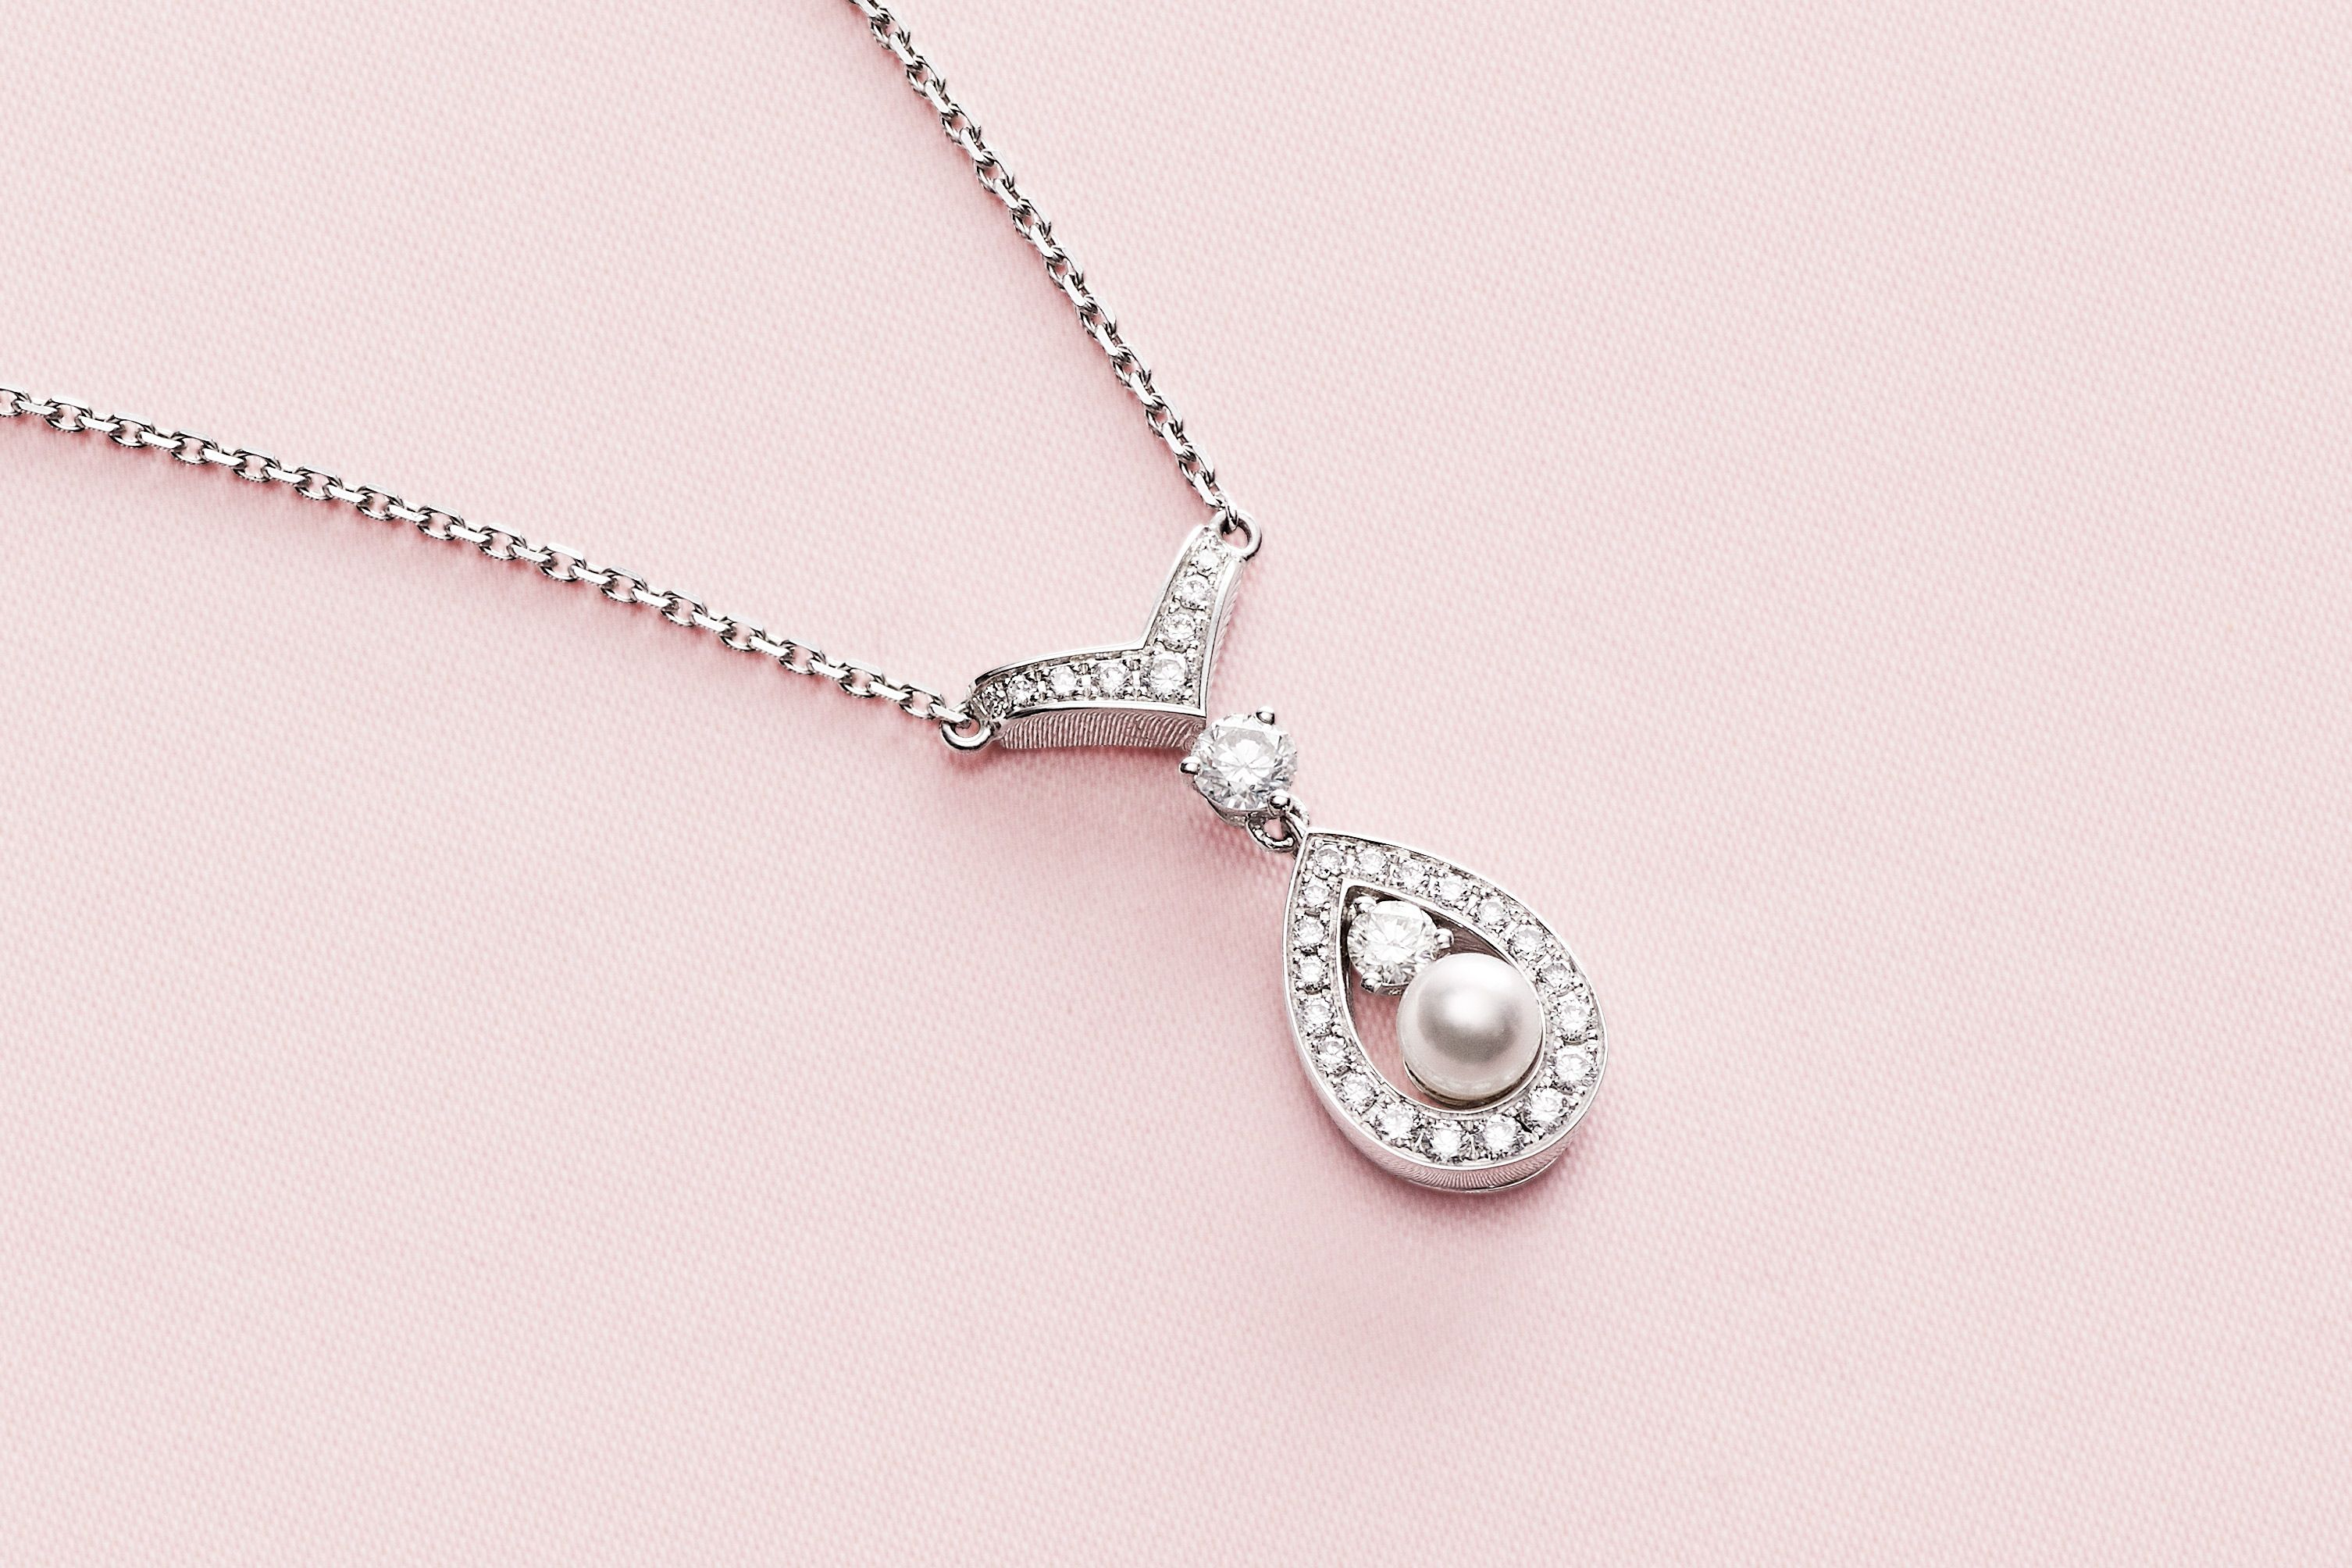 Brilliant Bijou 14k White Gold Diamond Cut Beaded Pendant Chain Necklace